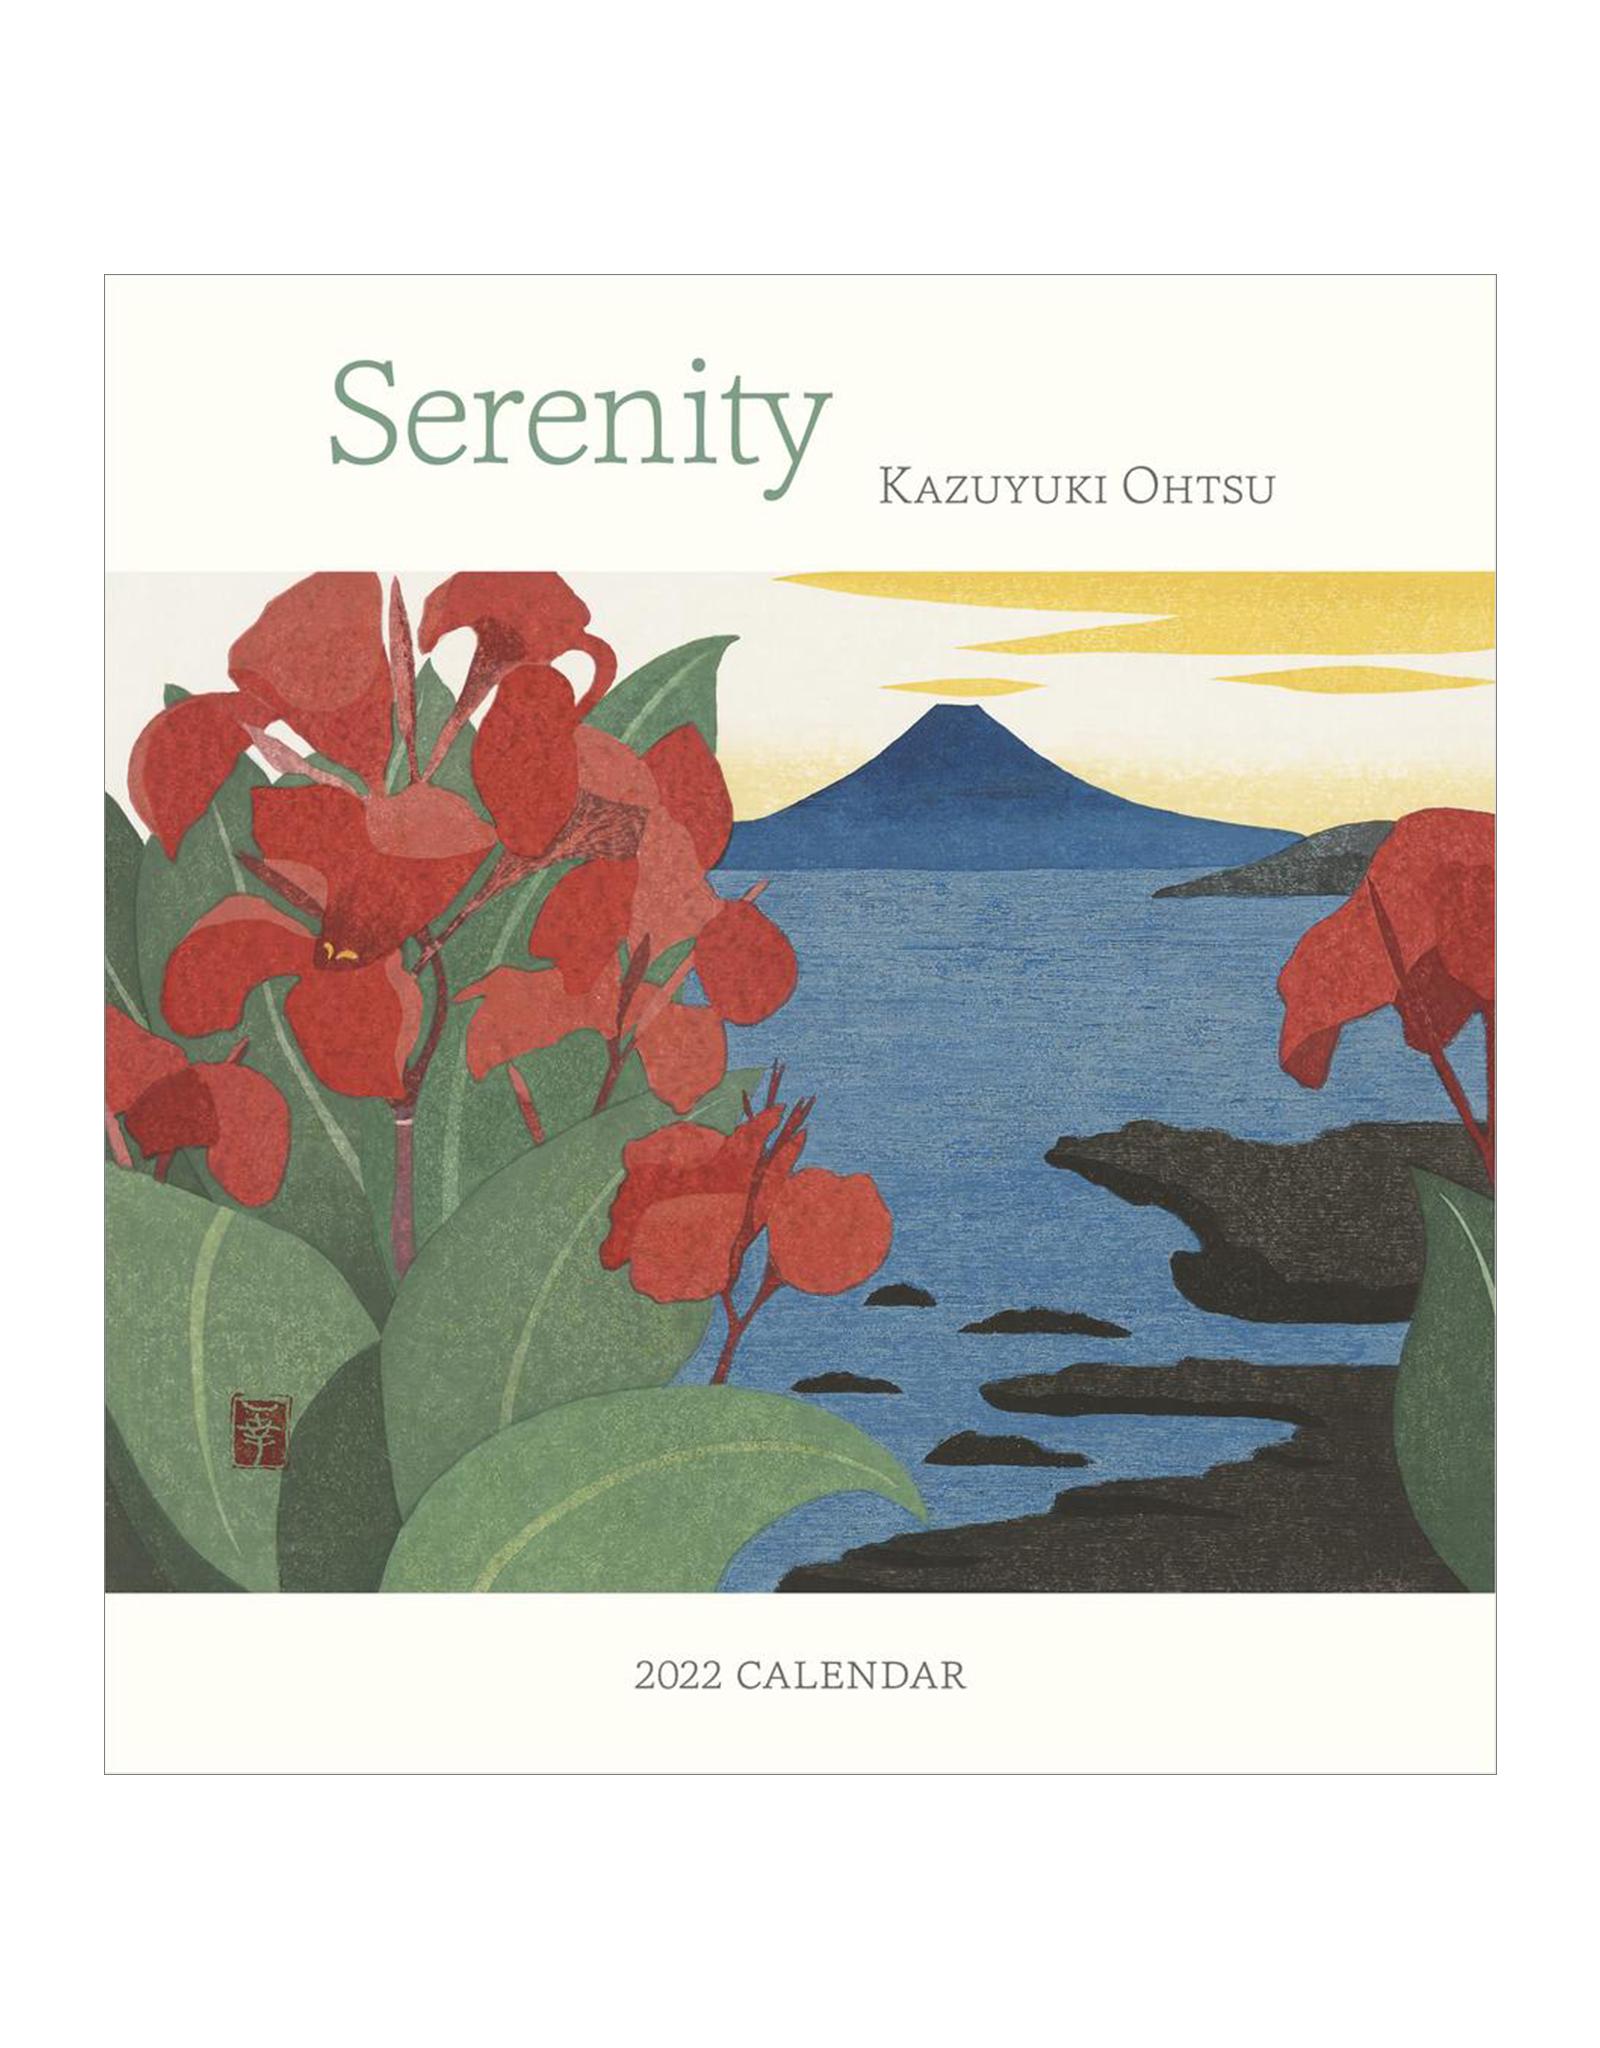 Serenity: Kazuyuki Ohtsu 2022 Mini Wall Calendar